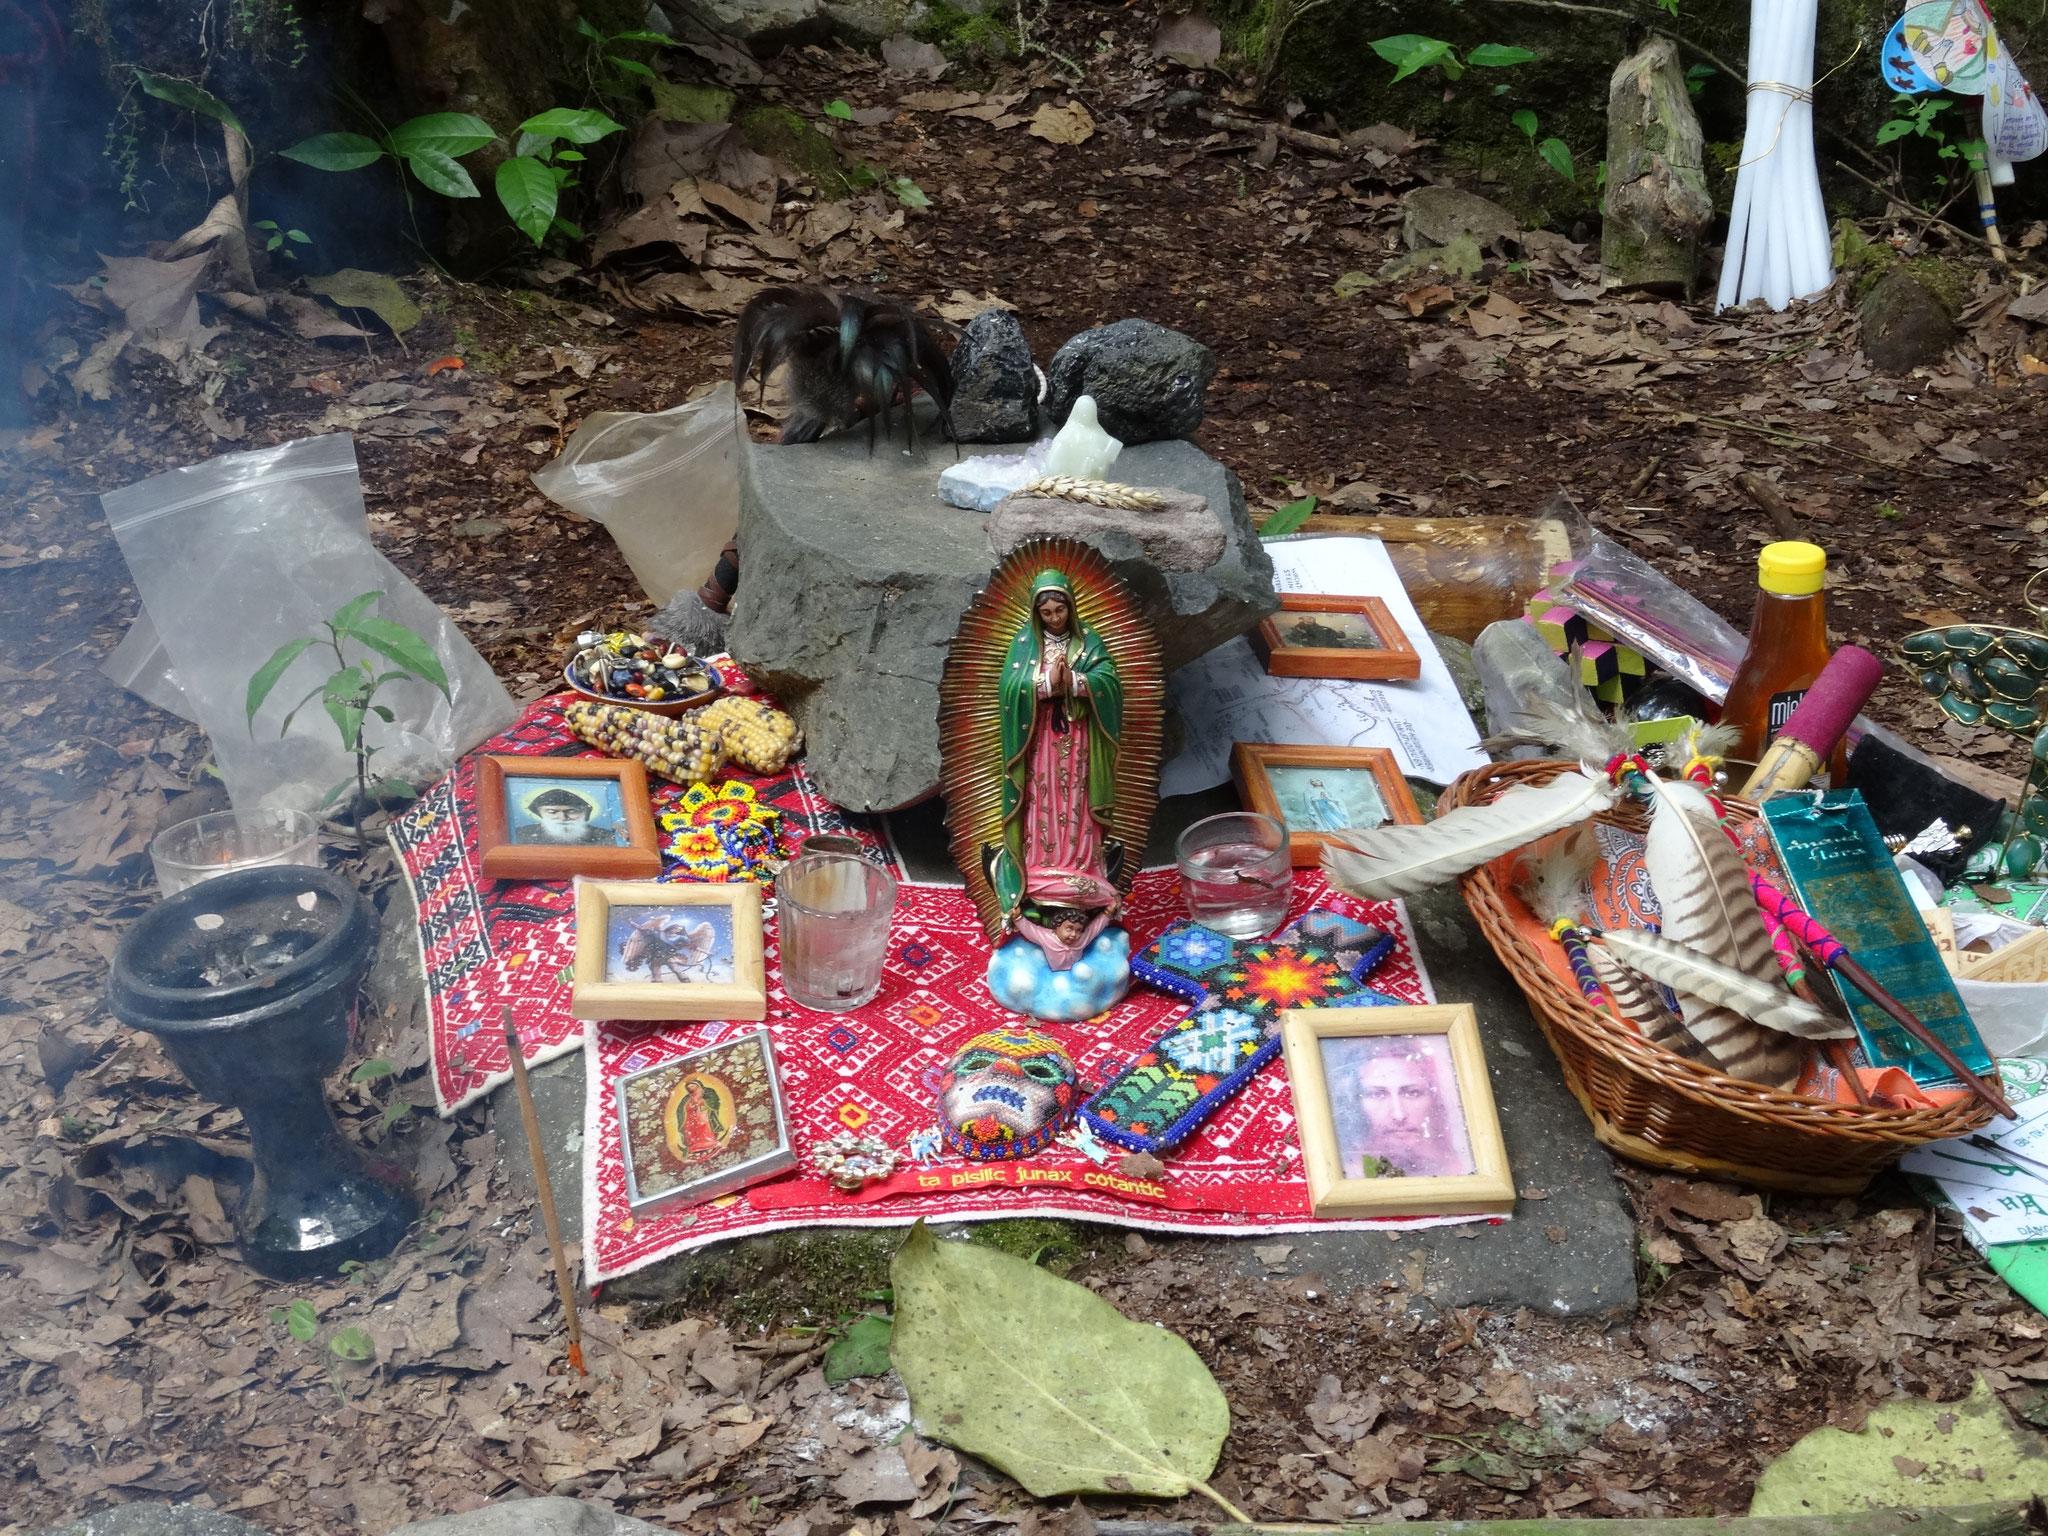 ¿ya has creado tu altar? / hast du deinen Altar schon gebaut?